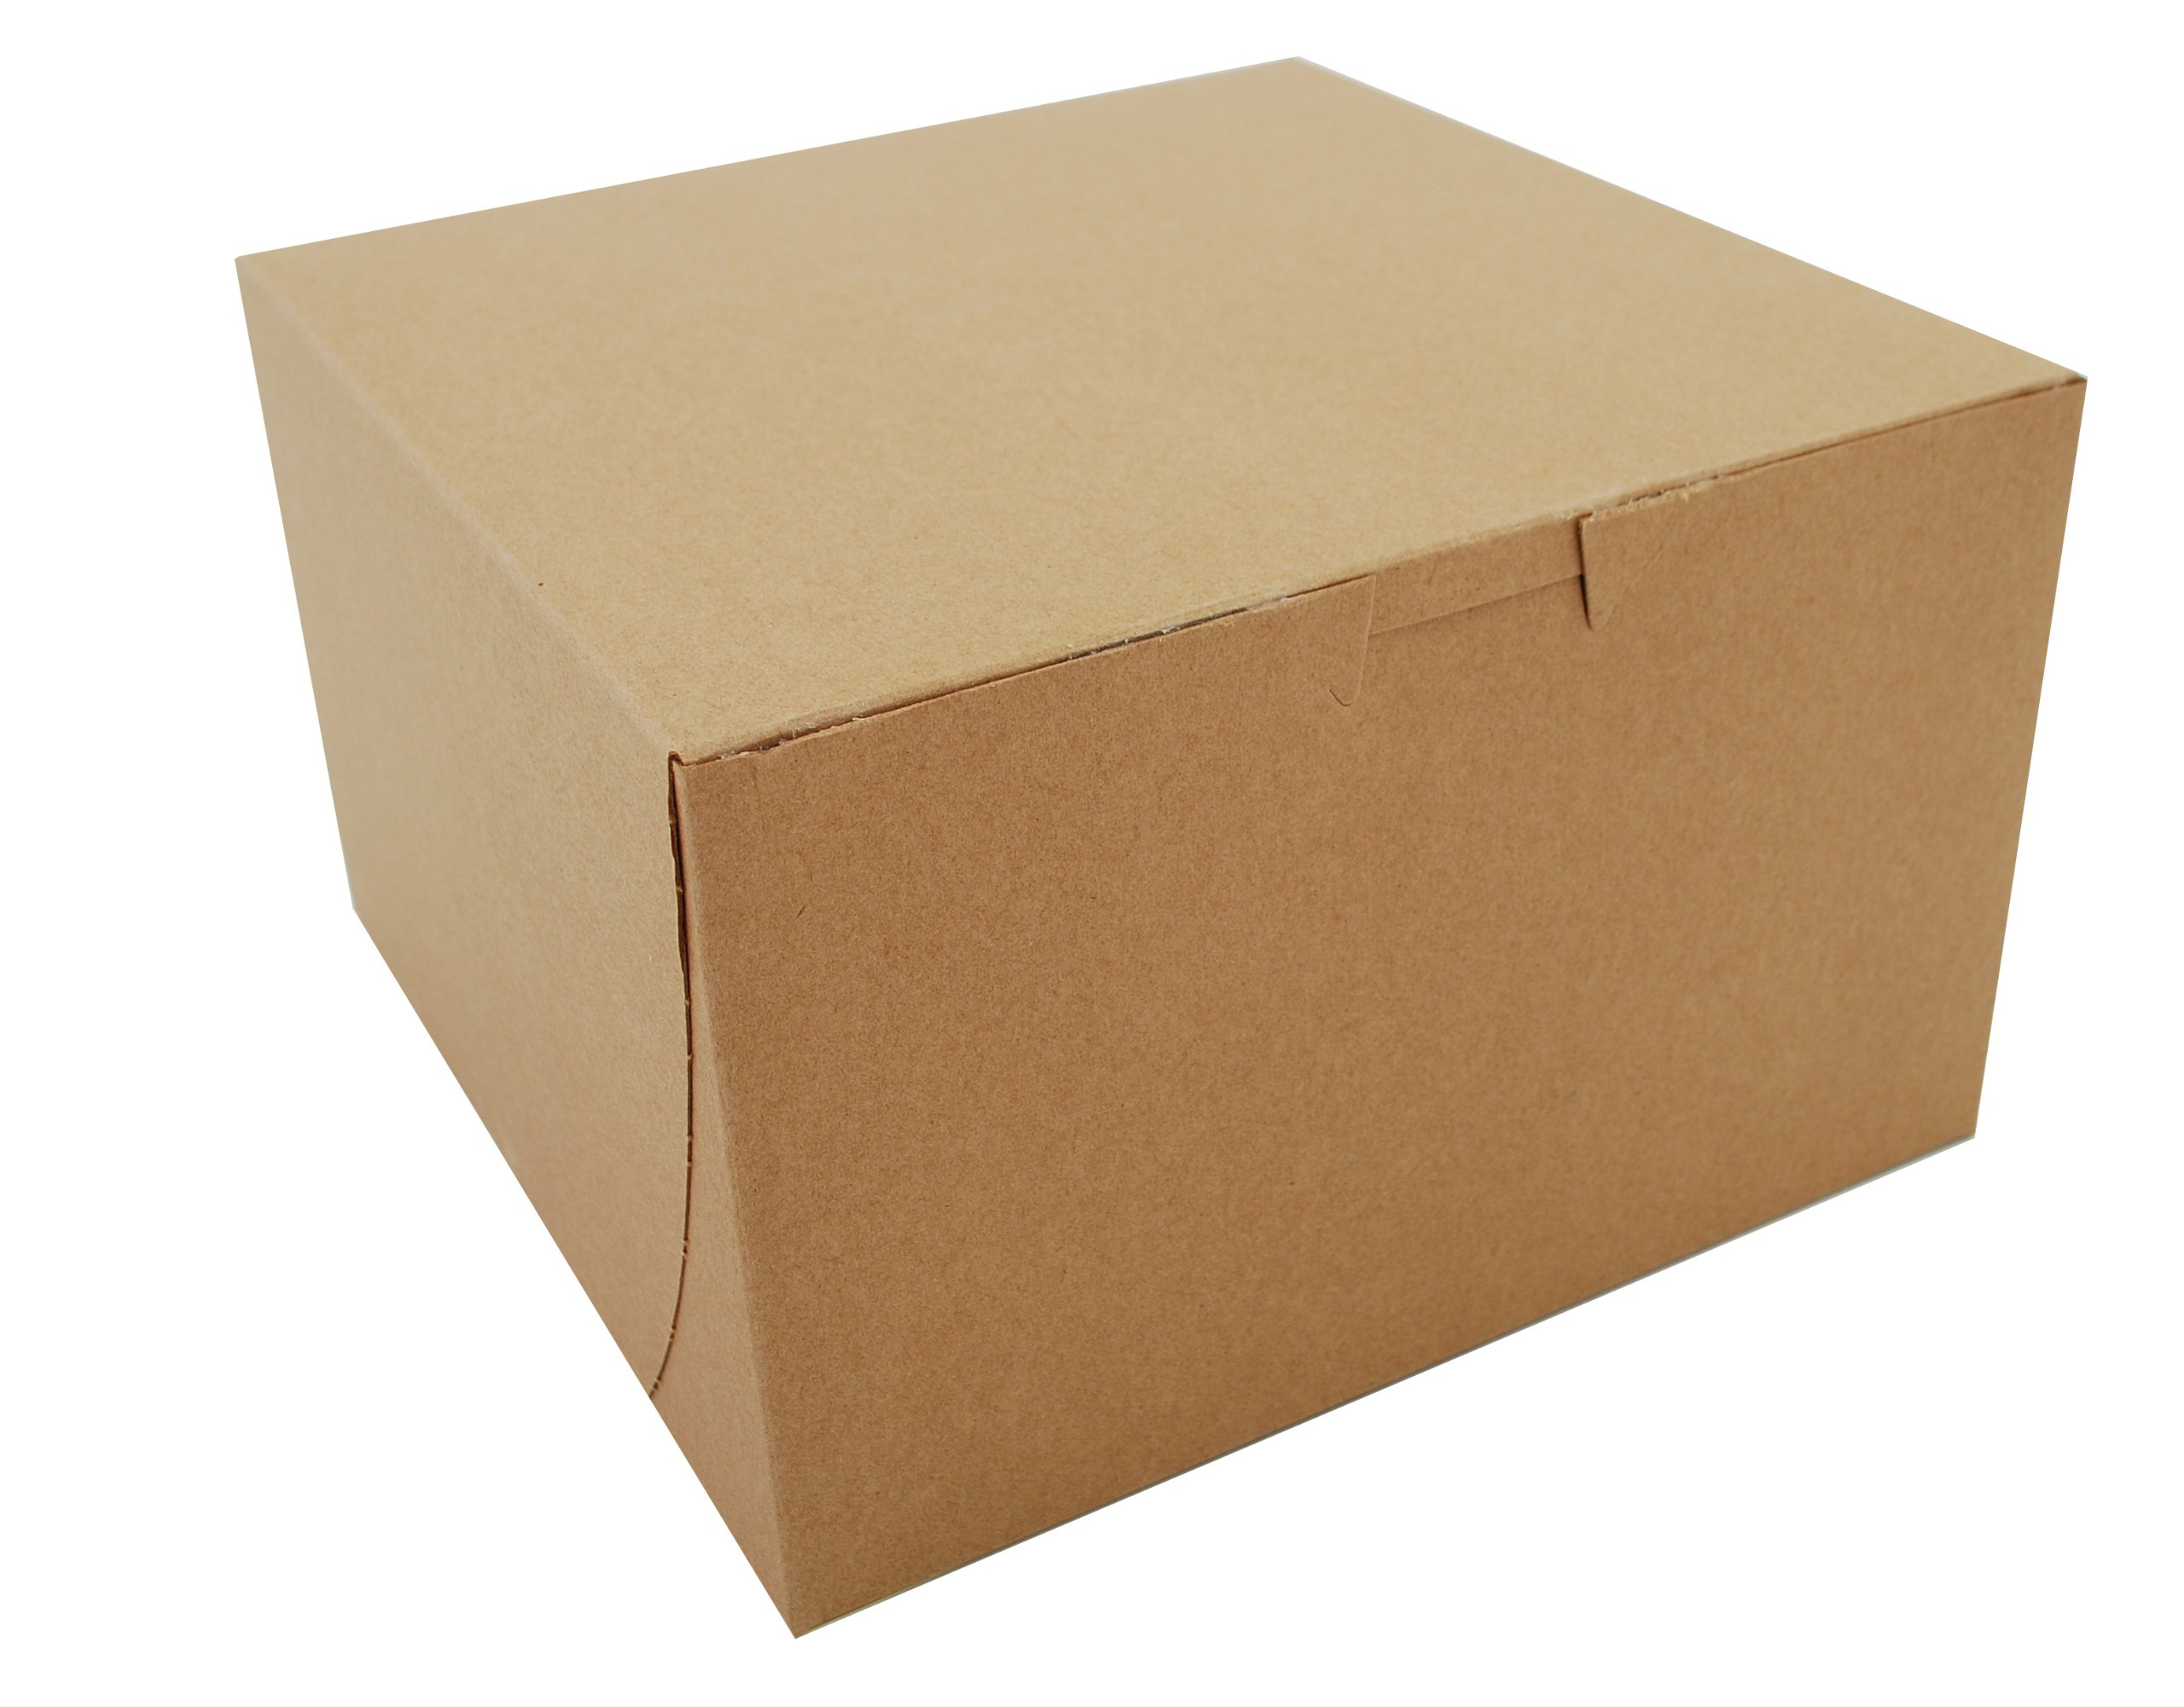 Southern Champion Tray 09455K Kraft Paperboard Non Window Lock Corner Bakery Box, 8'' Length x 8'' Width x 5'' Height (Case of 100)